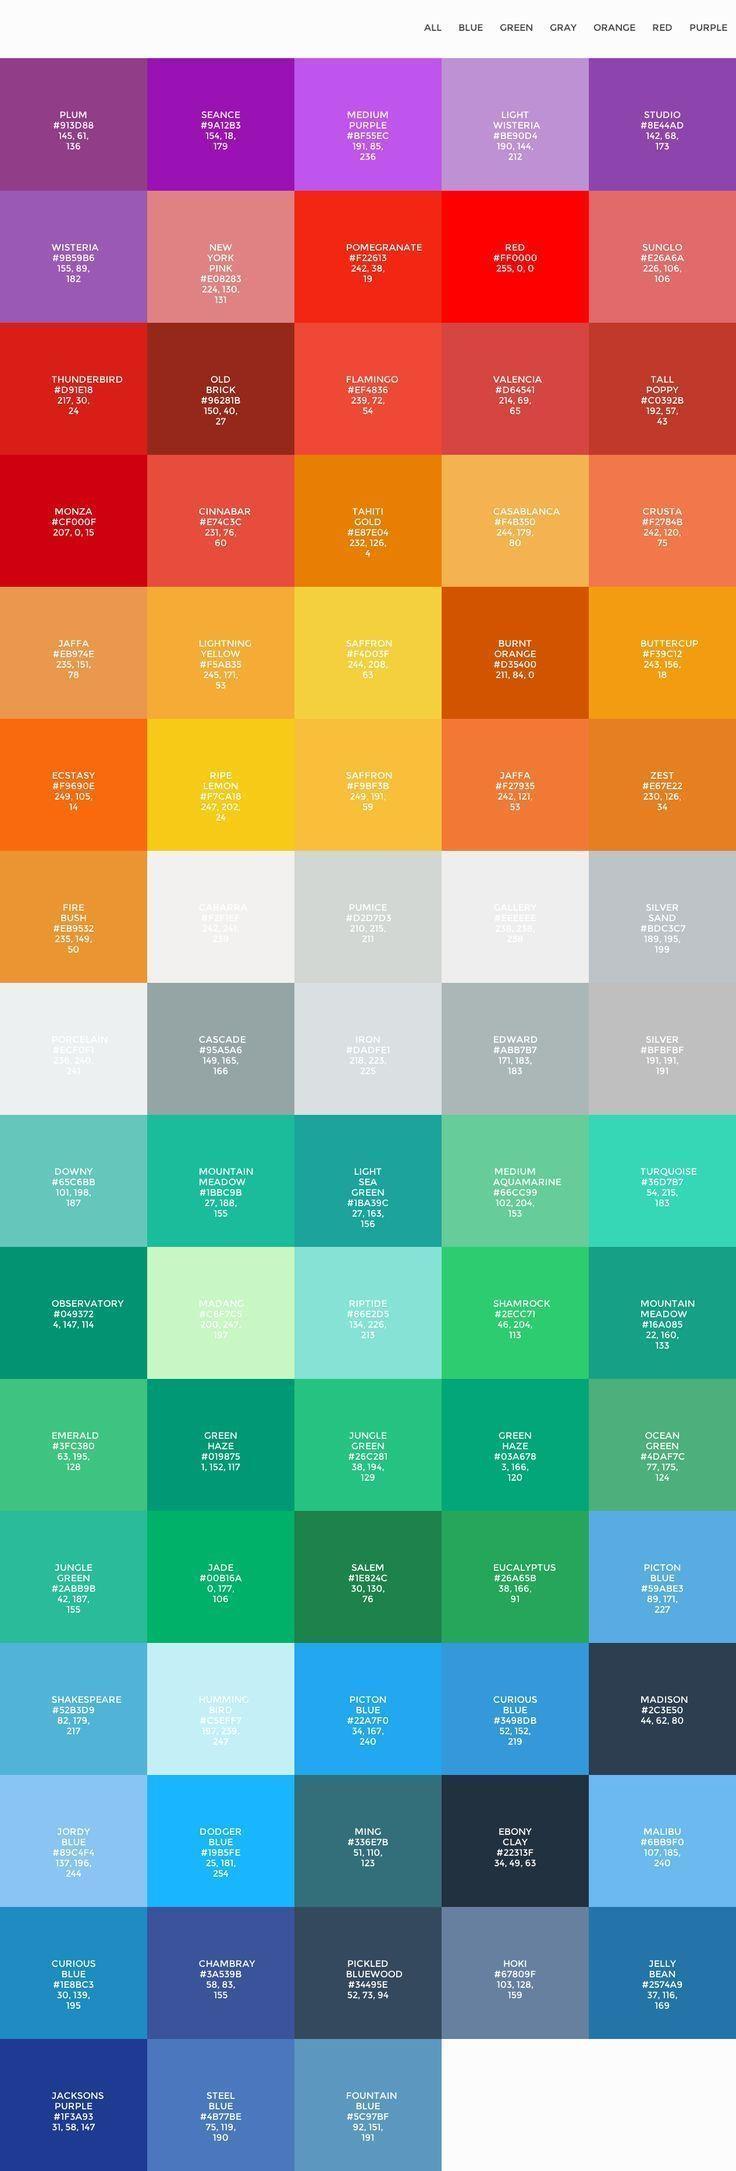 Flat UI colors palettes #webdesign #webdesign #webdesign